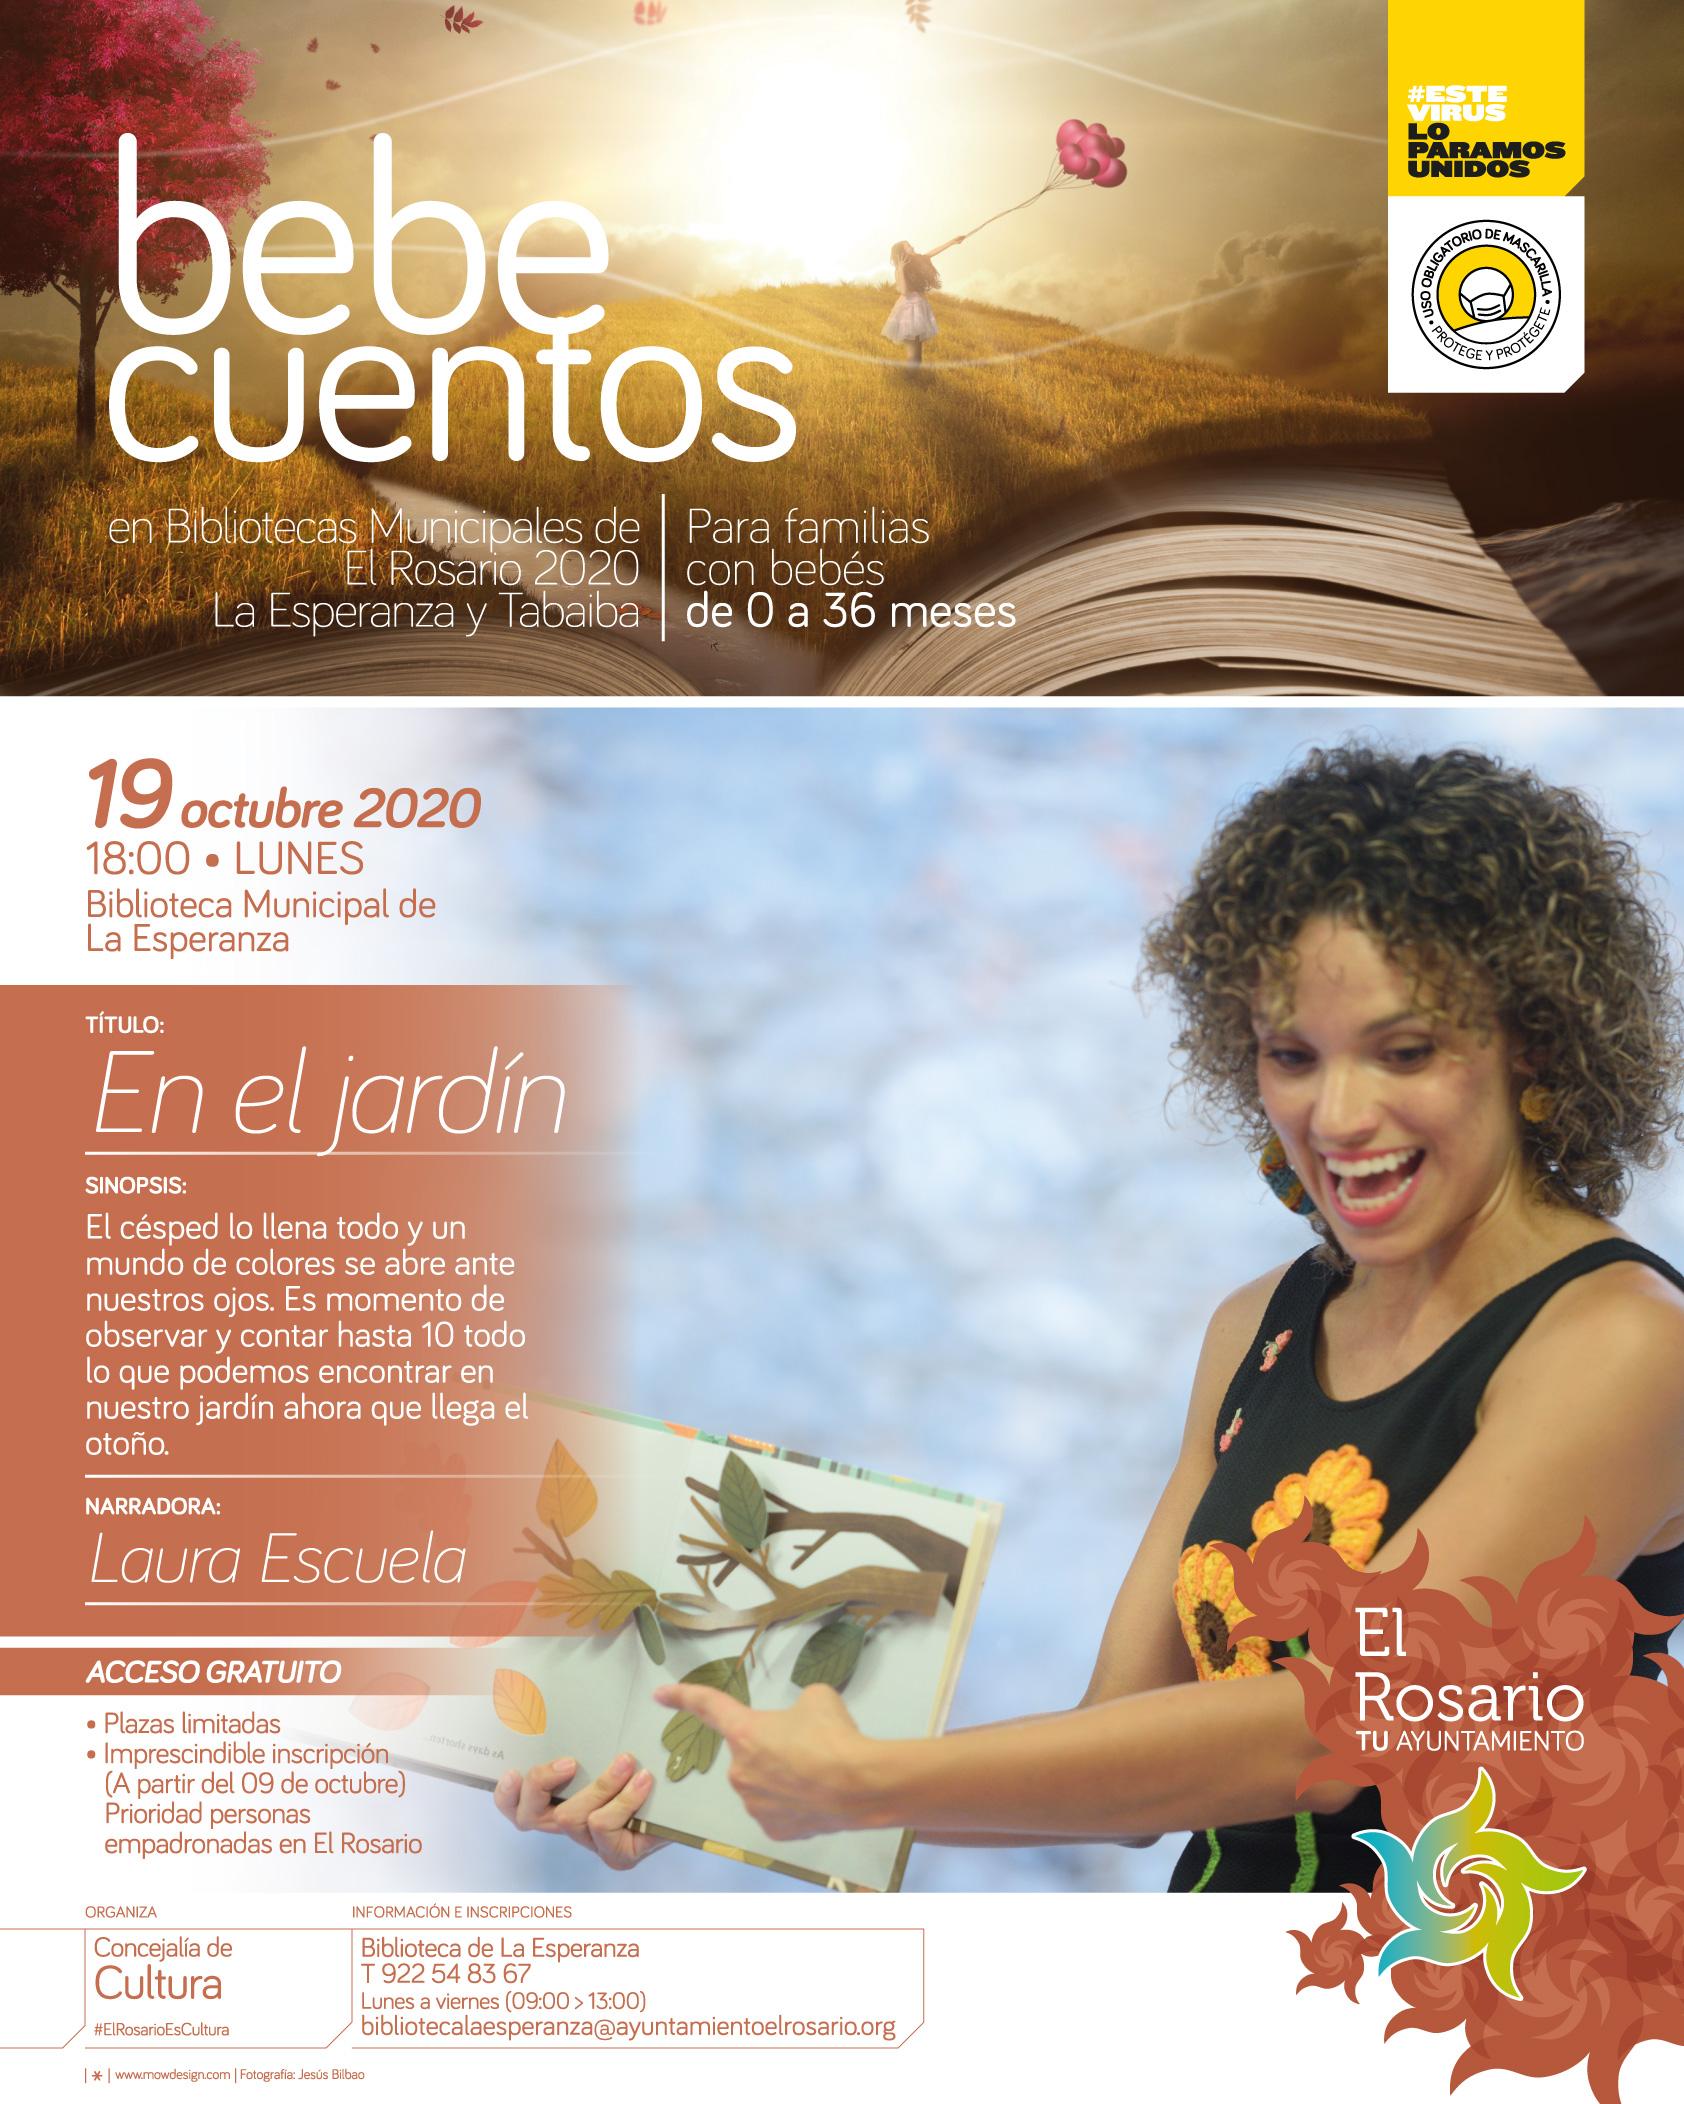 BEBECUENTOS-20201019-CARTEL_A3-20201009-01af-redes